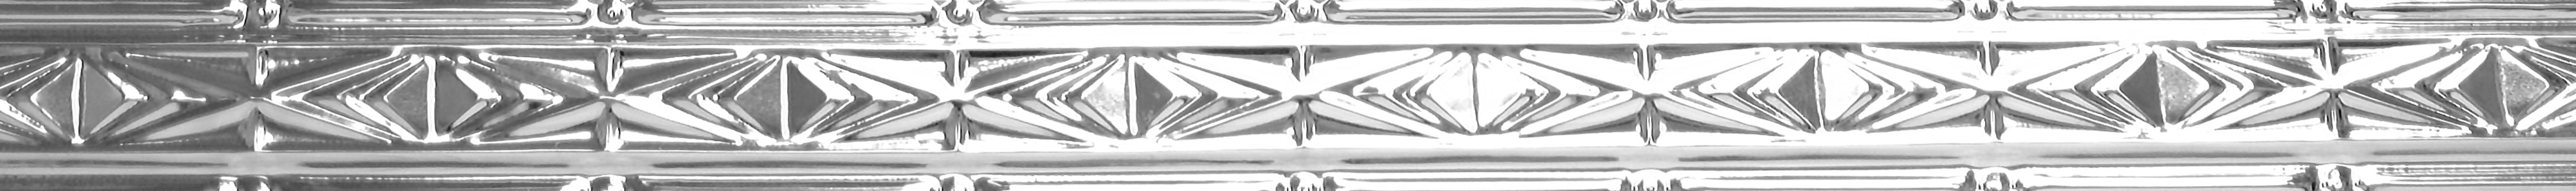 Deco Arrows - Shanko Tin Cornice - #909